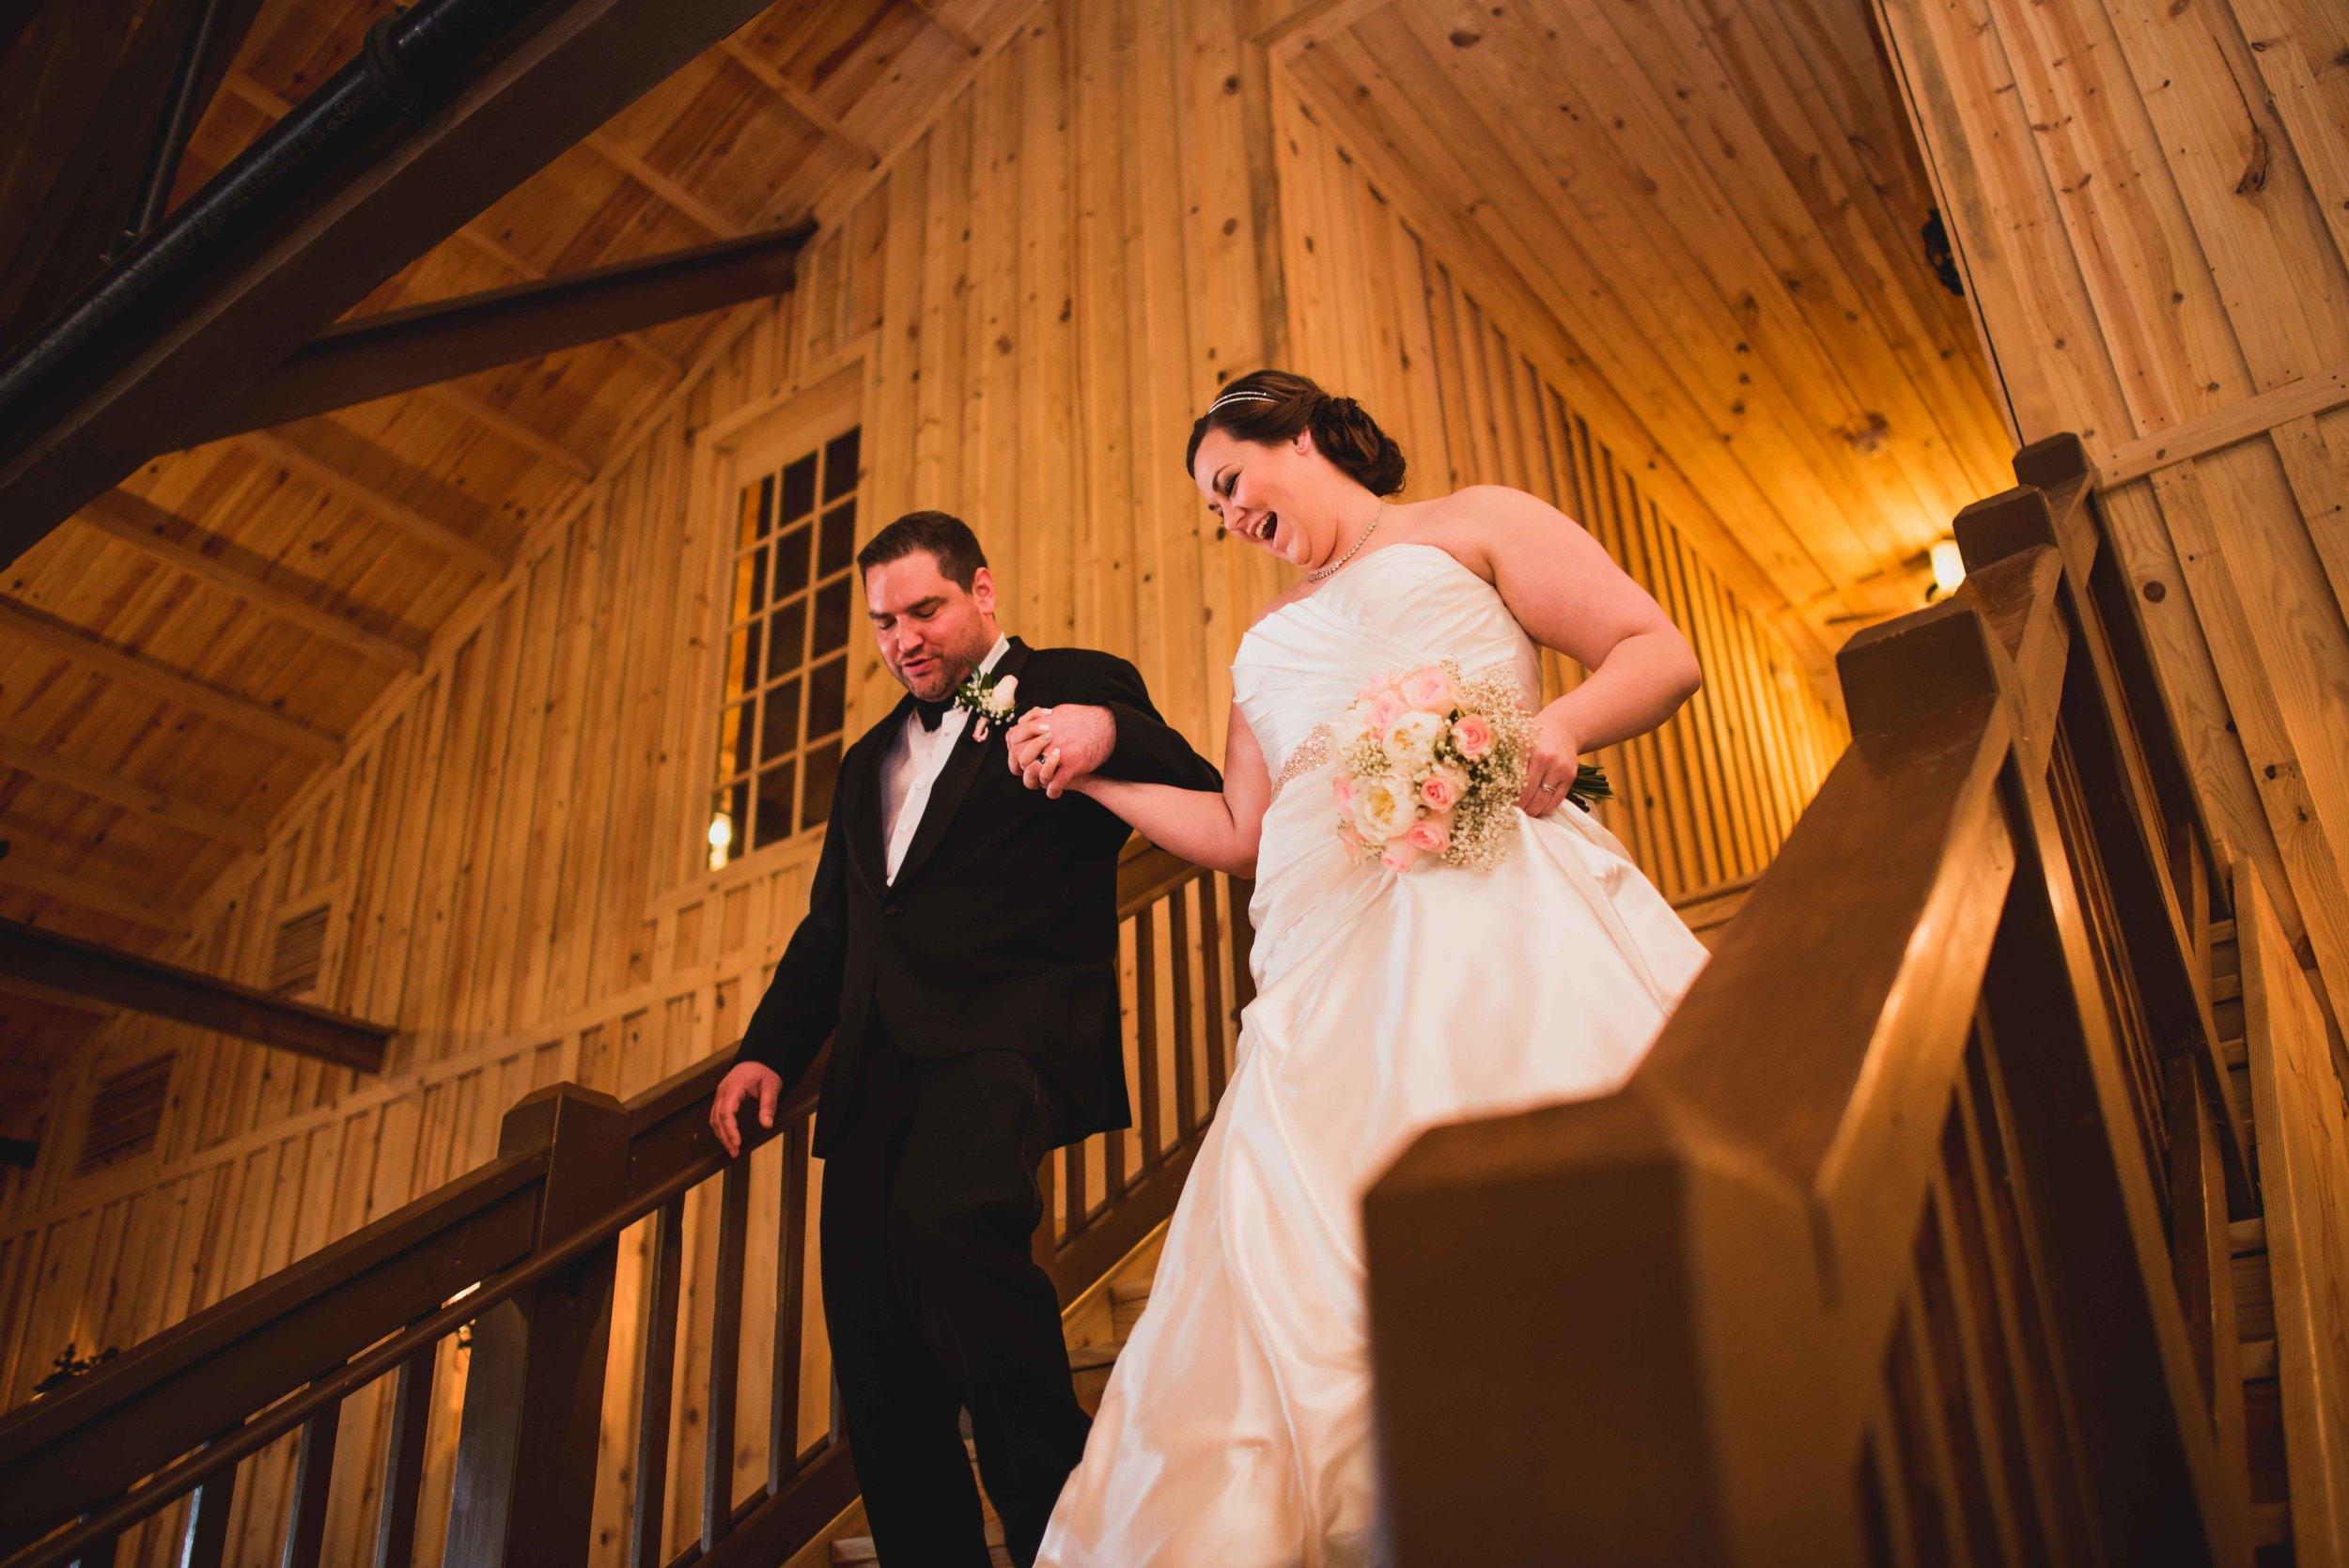 Dallas Wedding - Heritage Springs - Katie and Dustin - Entrance